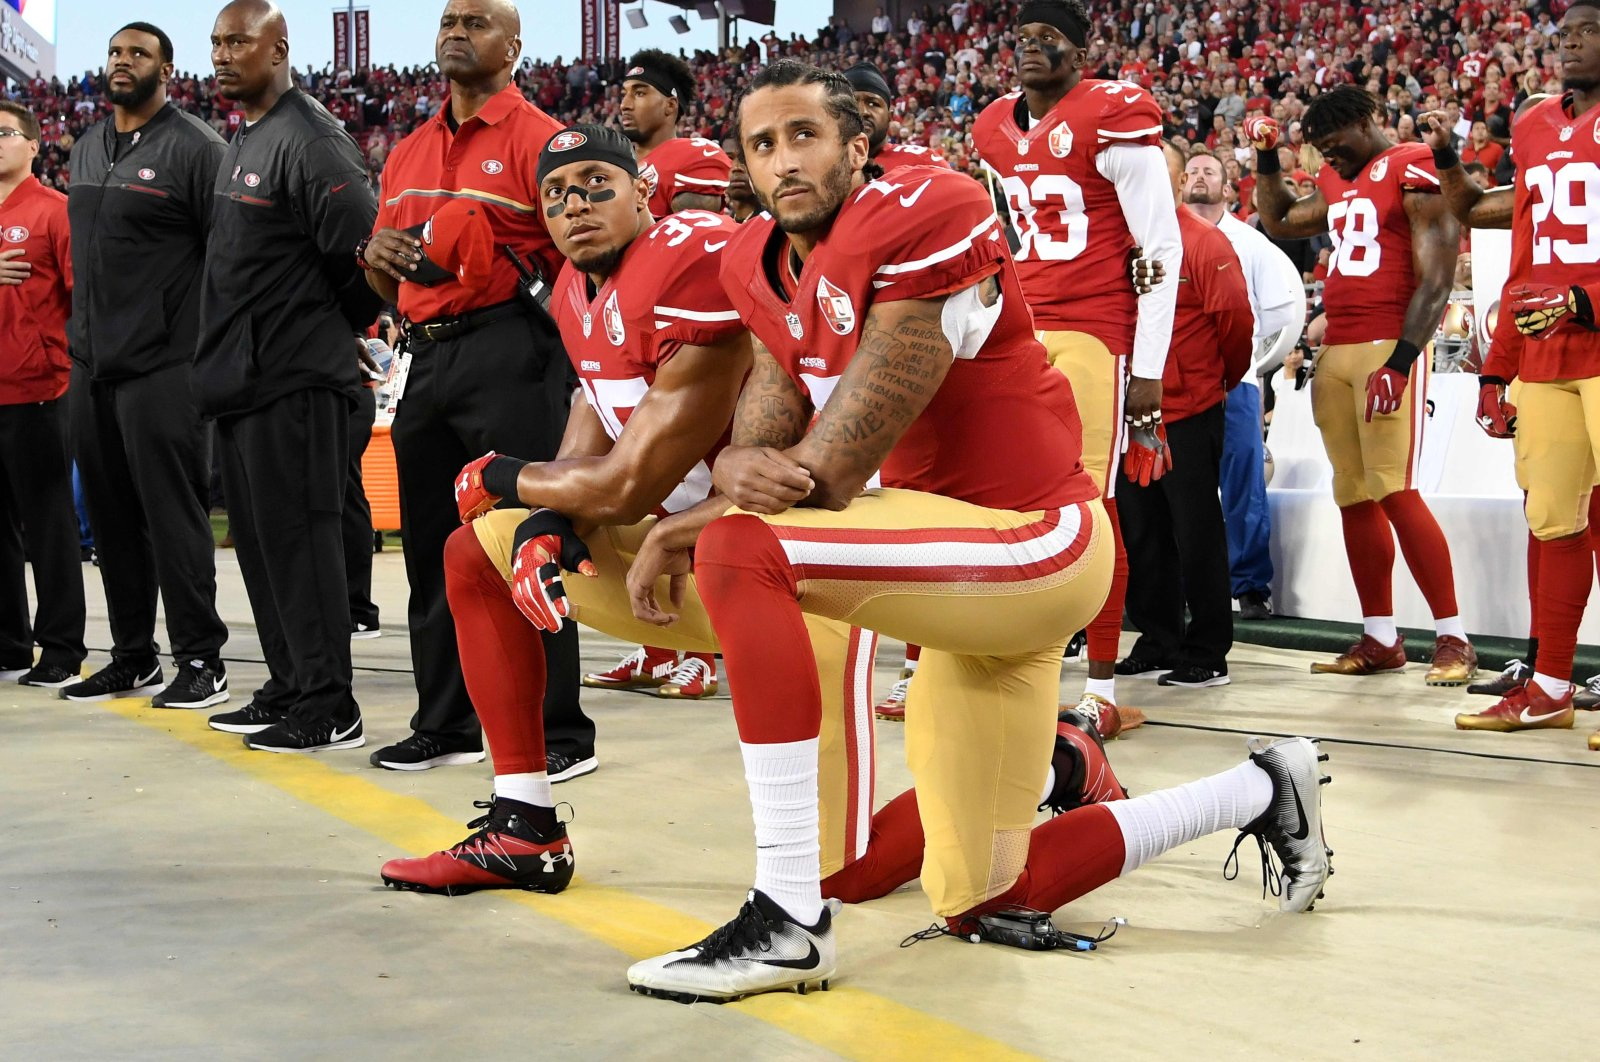 Colin Kaepernick, front, kneel in protest during the U.S. national anthem prior to an NFL game in Santa Clara, Calif., U.S., Sept. 12, 2016. (AFP Photo)